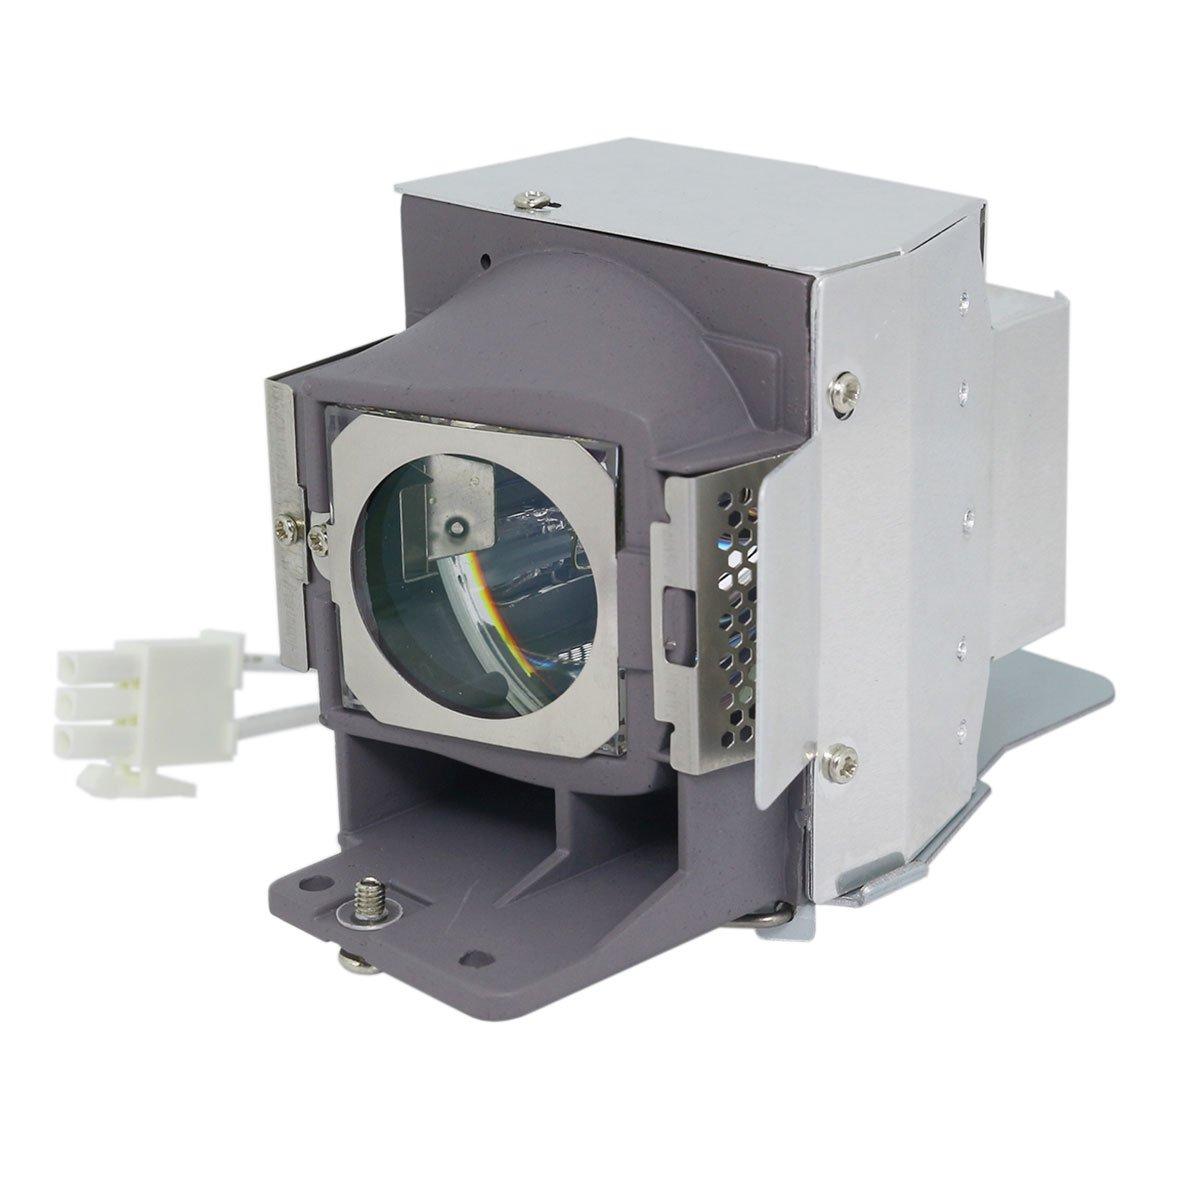 Kingoo 優れたプロジェクターランプ VIEWSONIC PJD6543W RLC-085用 交換用プロジェクターランプ ハウジング付き B074GVQ468